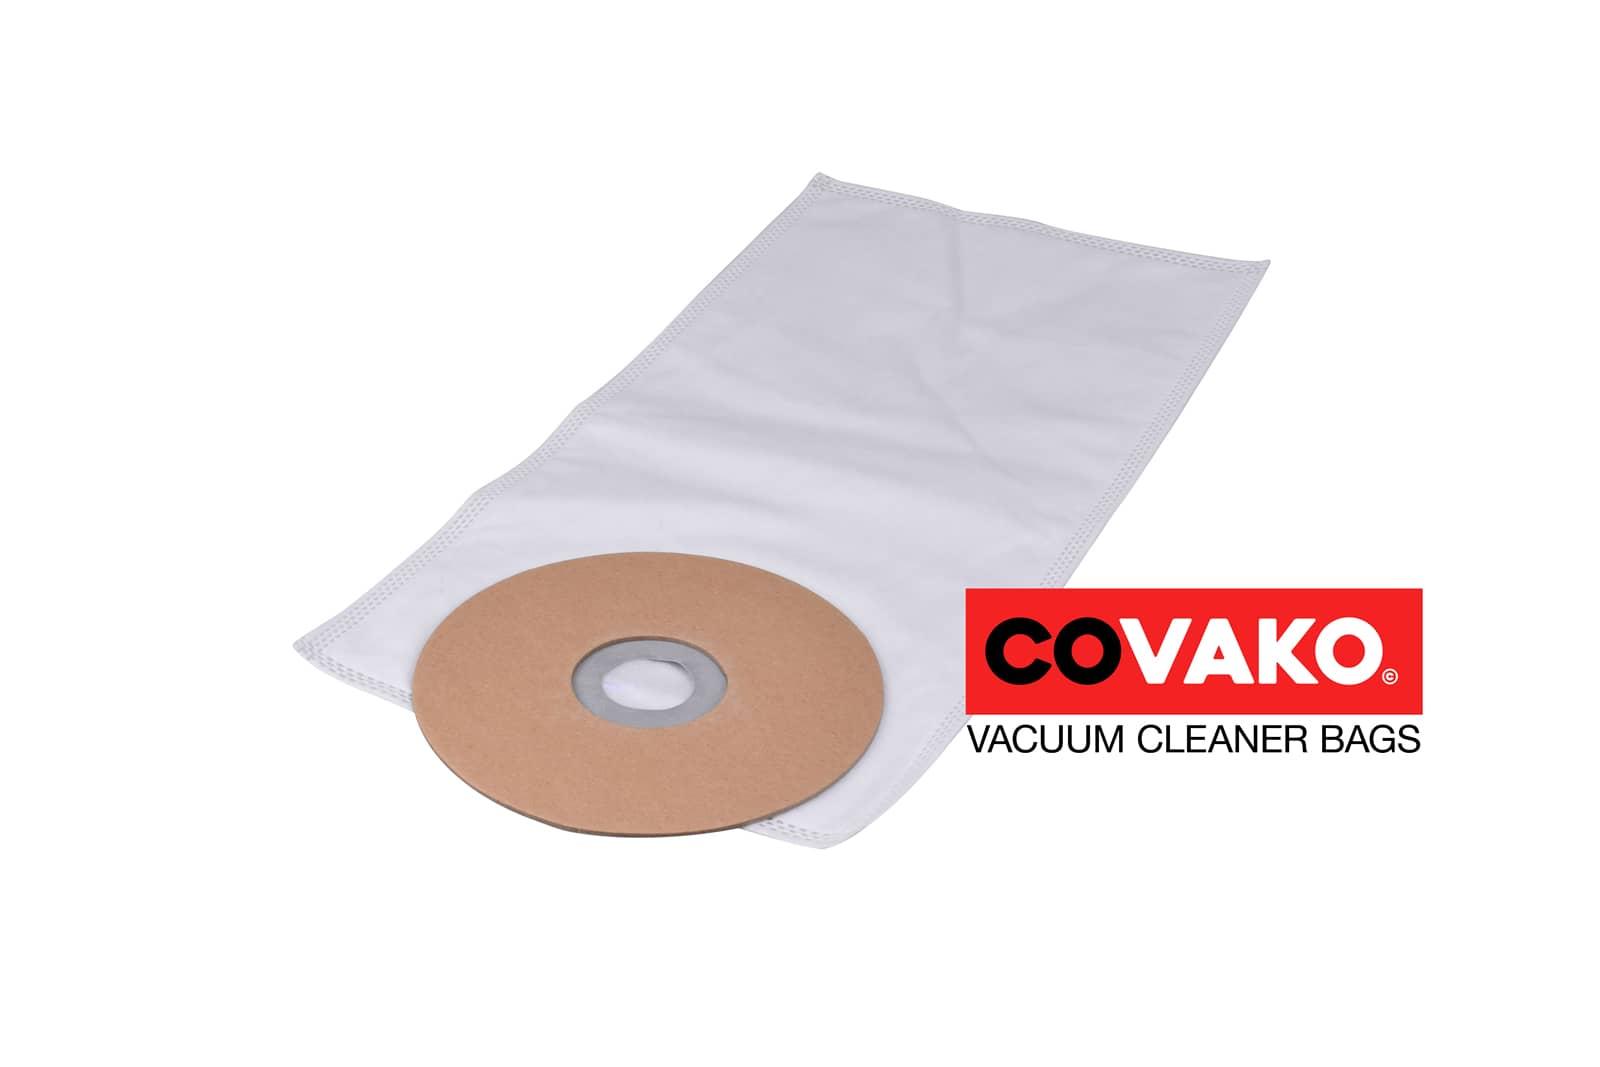 Fimap FV 9 / Synthétique - Fimap sacs d'aspirateur